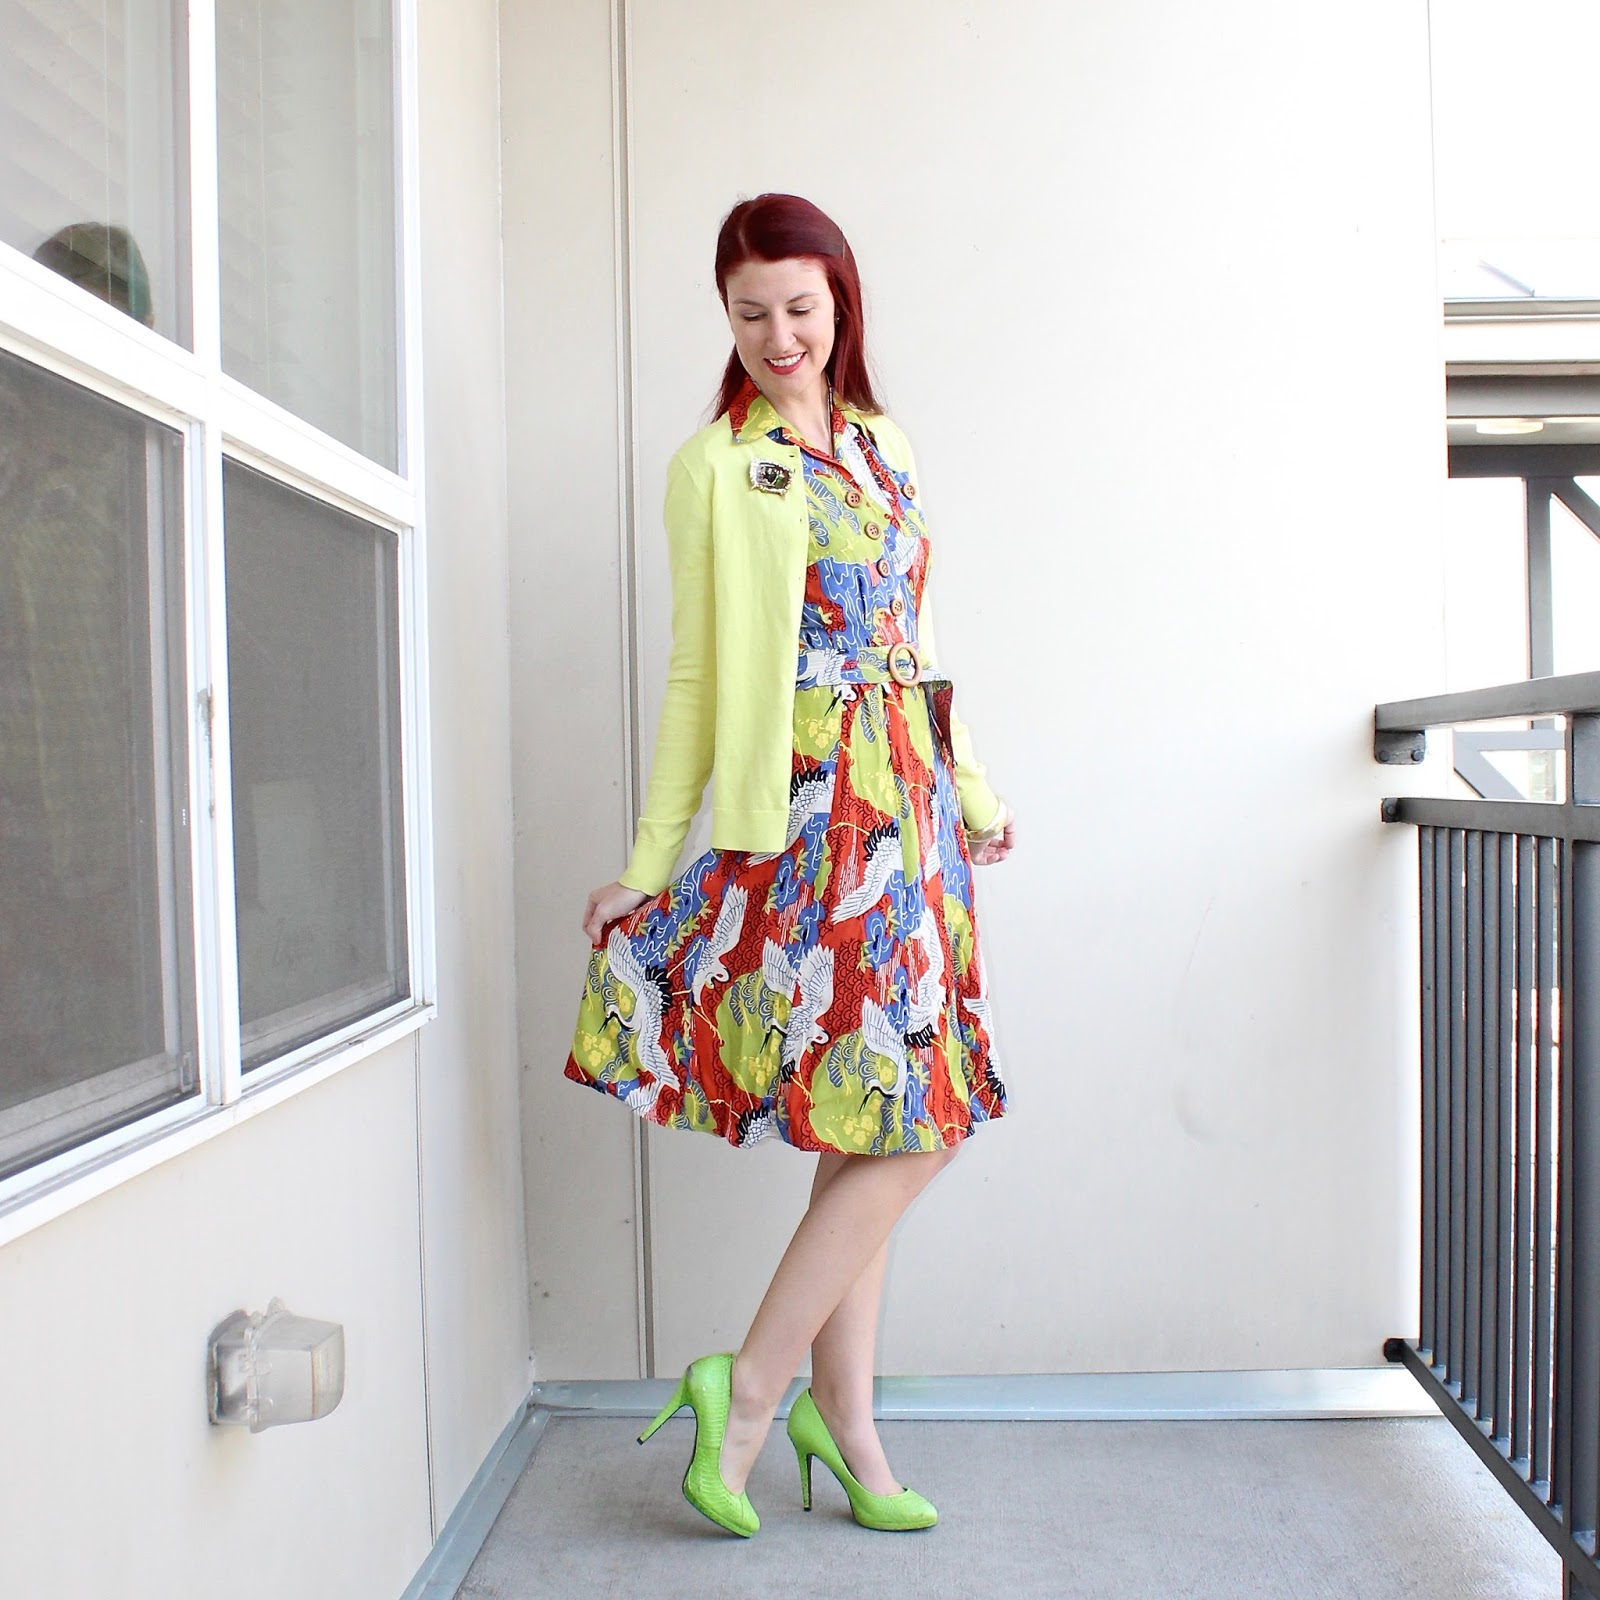 1a55b9cb2f Trashy Diva Cranes Sweetie Dress Review